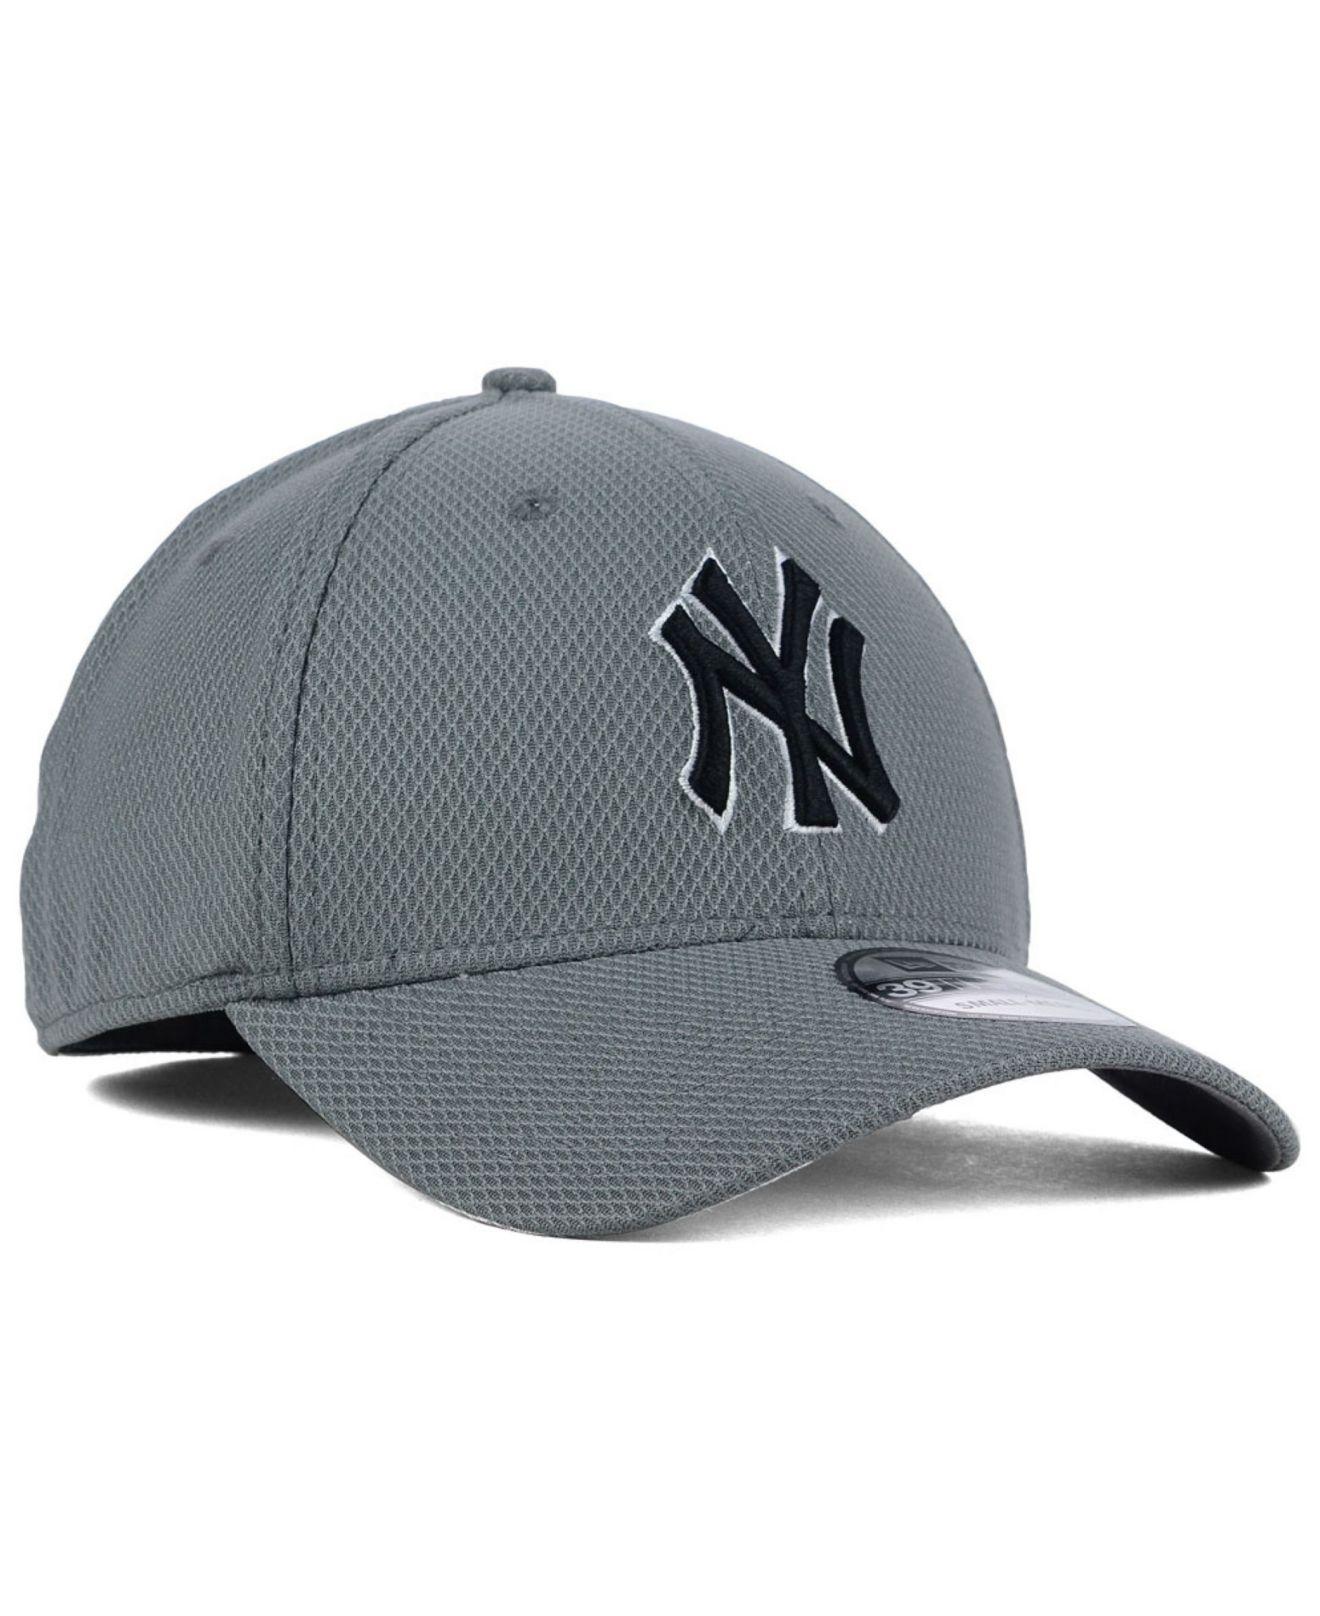 6d512af10bdc67 KTZ New York Yankees Diamond Era Gray Black White 39thirty Cap in ...